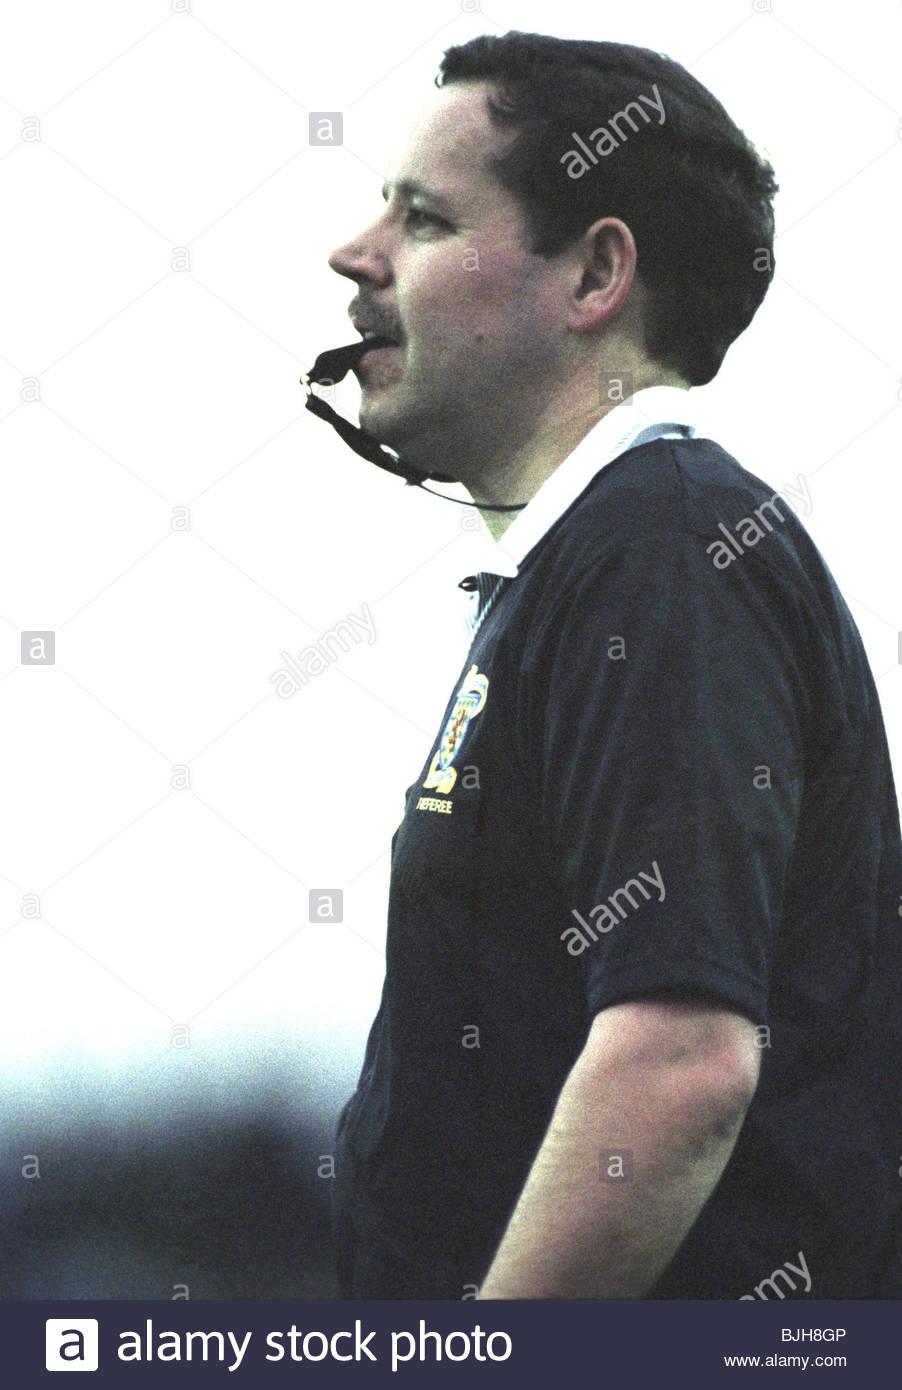 14/11/92 SCOTTISH PREMIER DIVISION AIRDRIE v ST JOHNSTONE (0-2) BROOMFIELD - AIRDRIE Referee Jim Herald - Stock Image